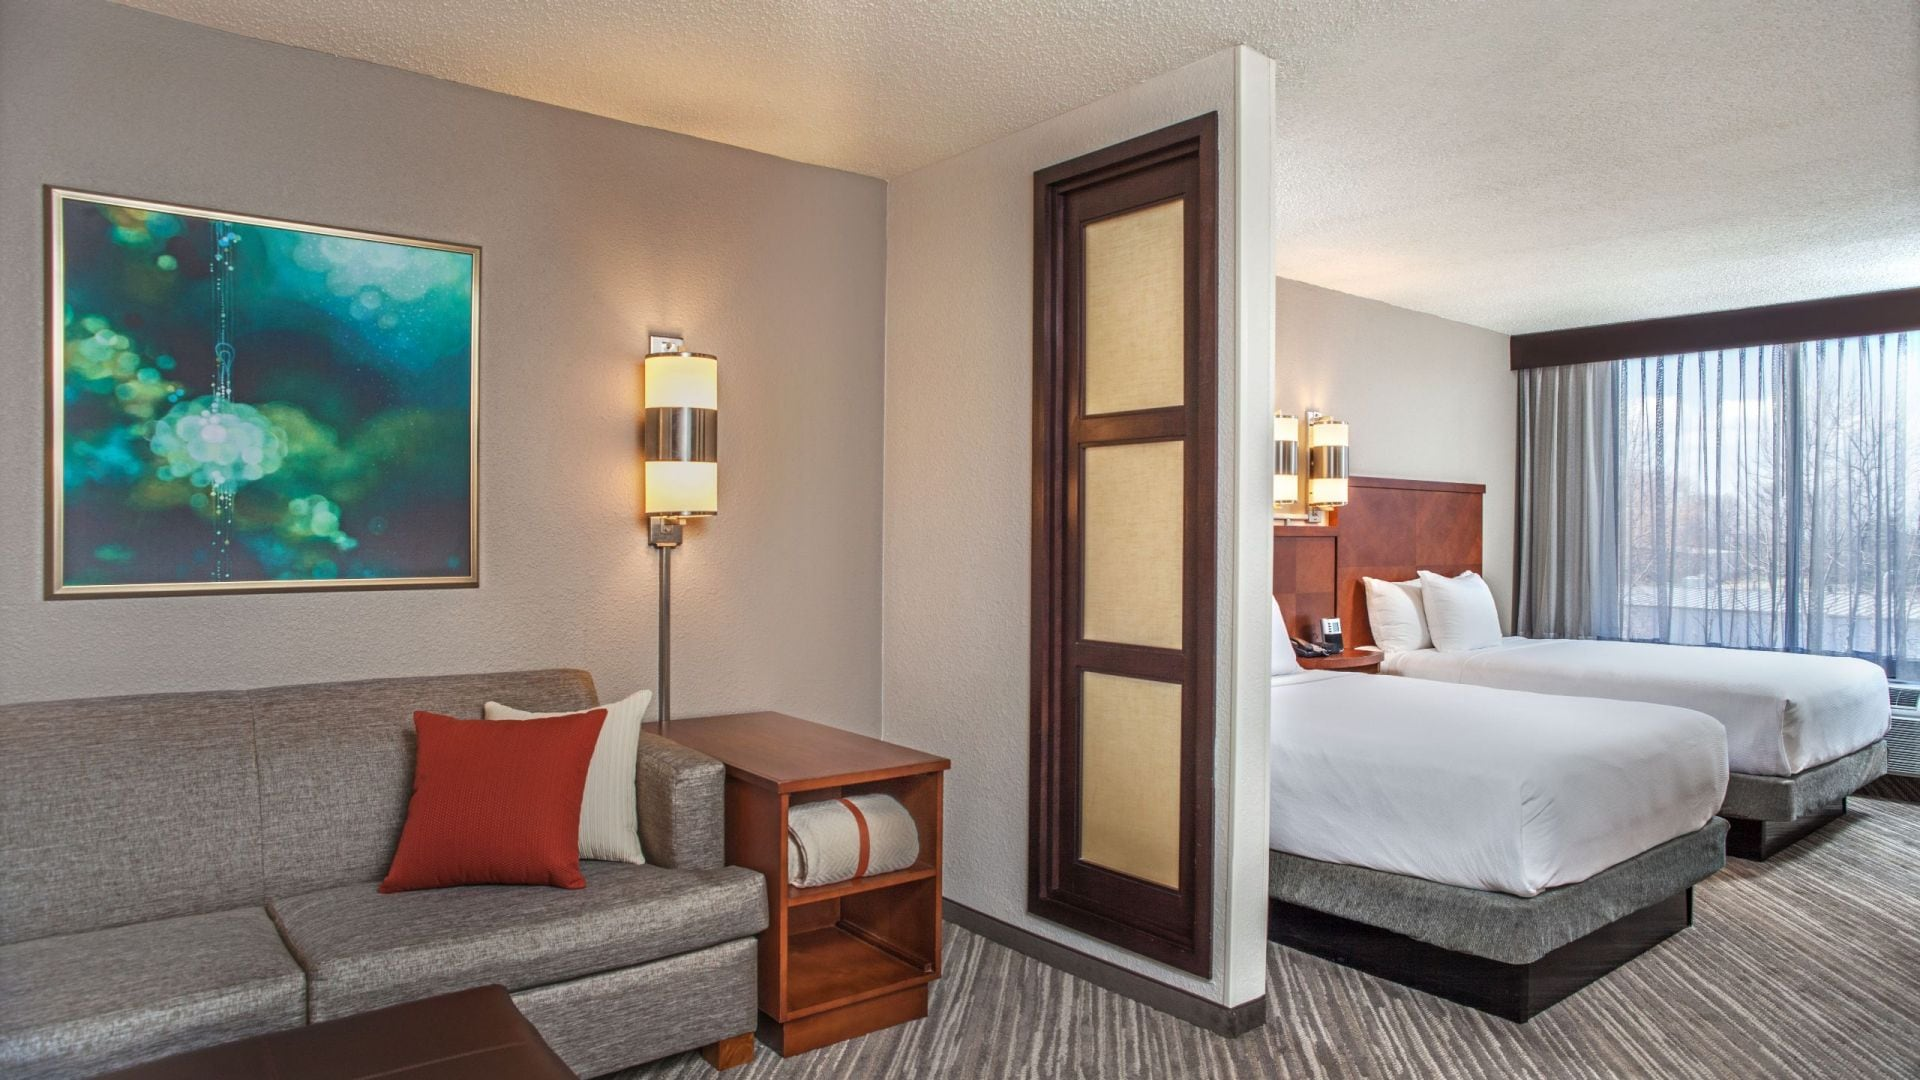 Hyatt Place Cincinnati / Blue Ash Two Queen Beds